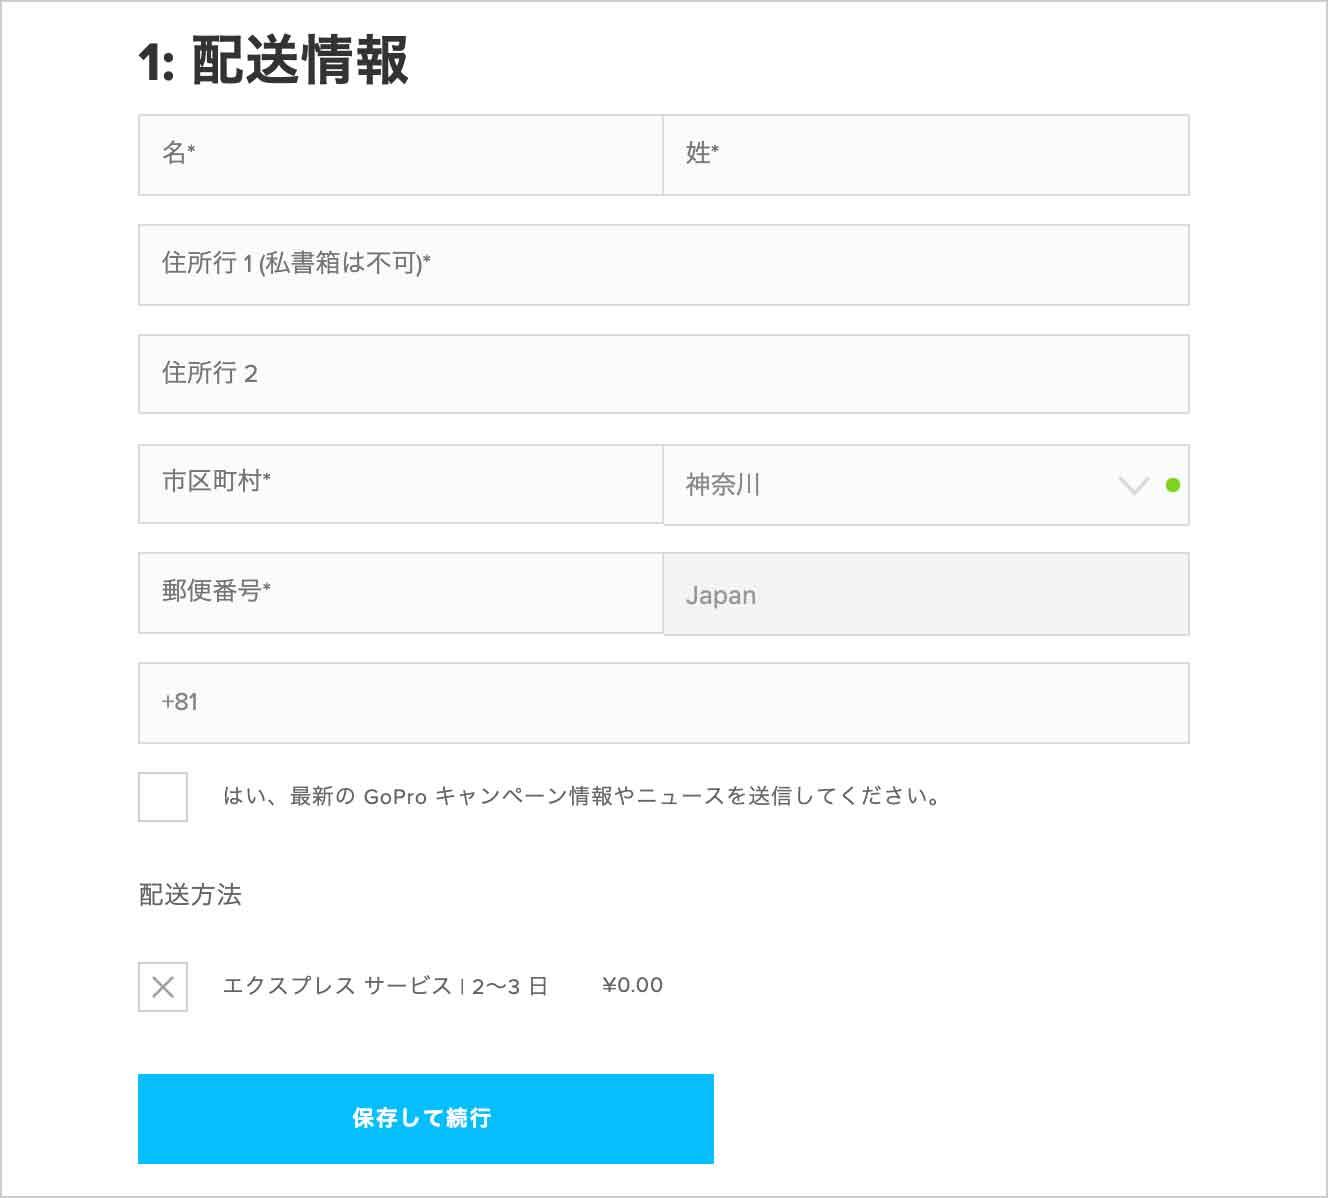 GoPro公式サイトの住所入力